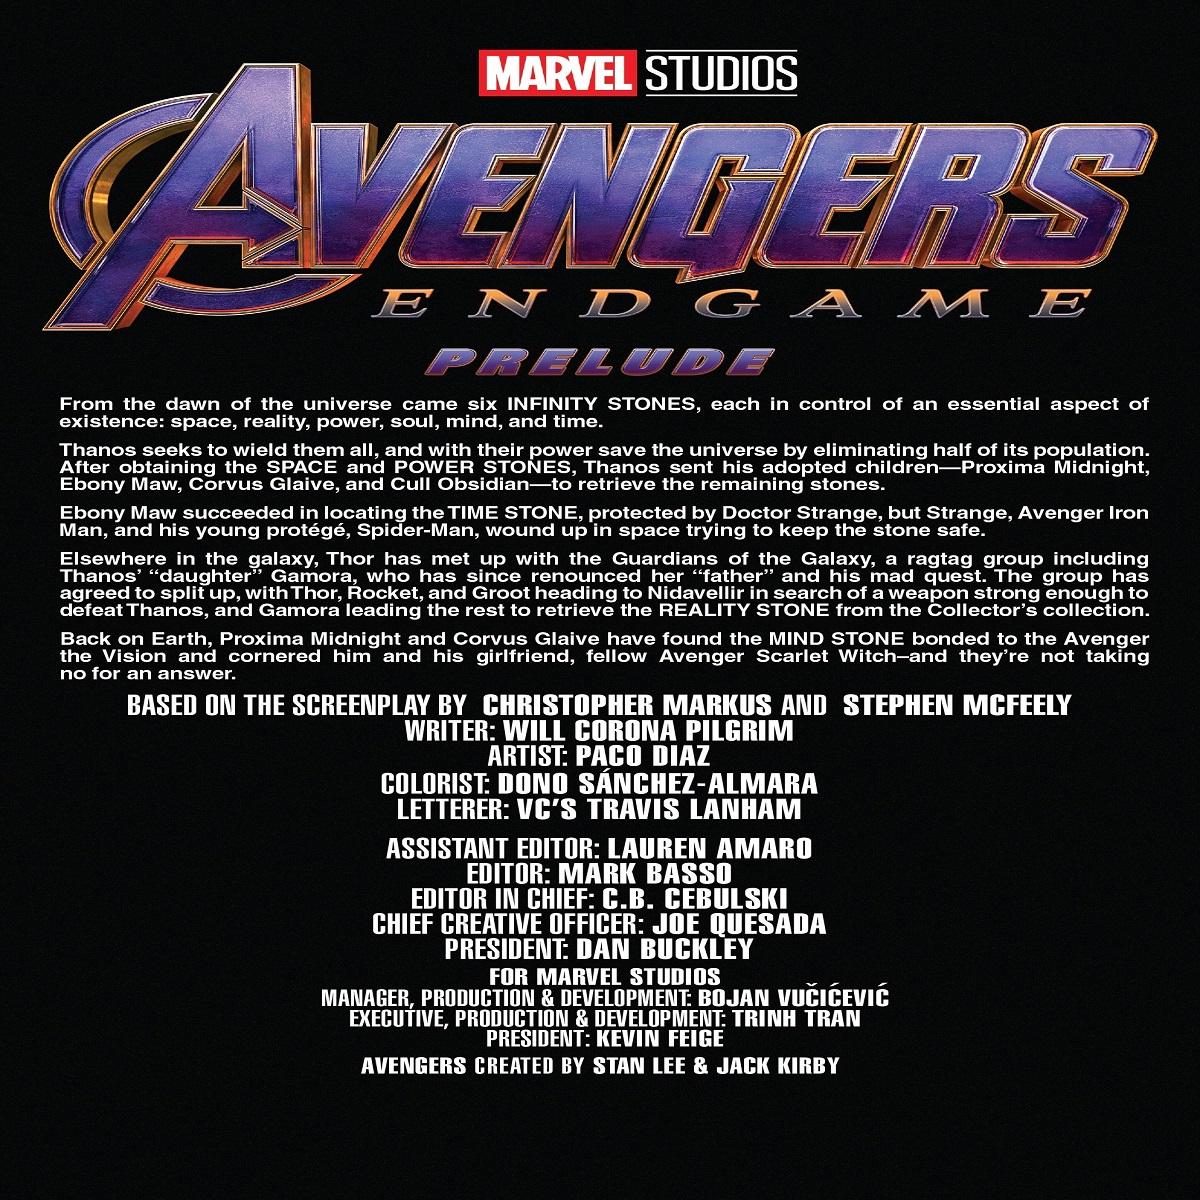 مجله Marvels Avengers Endgame Prelude 2 ژانویه 2019